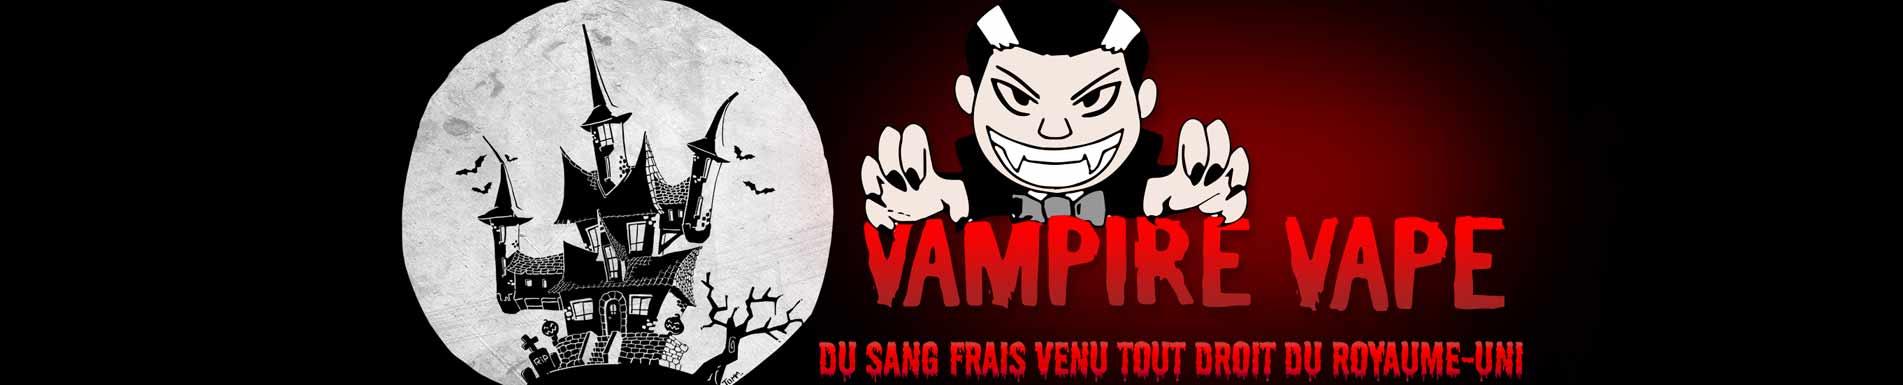 arôme vampire vape